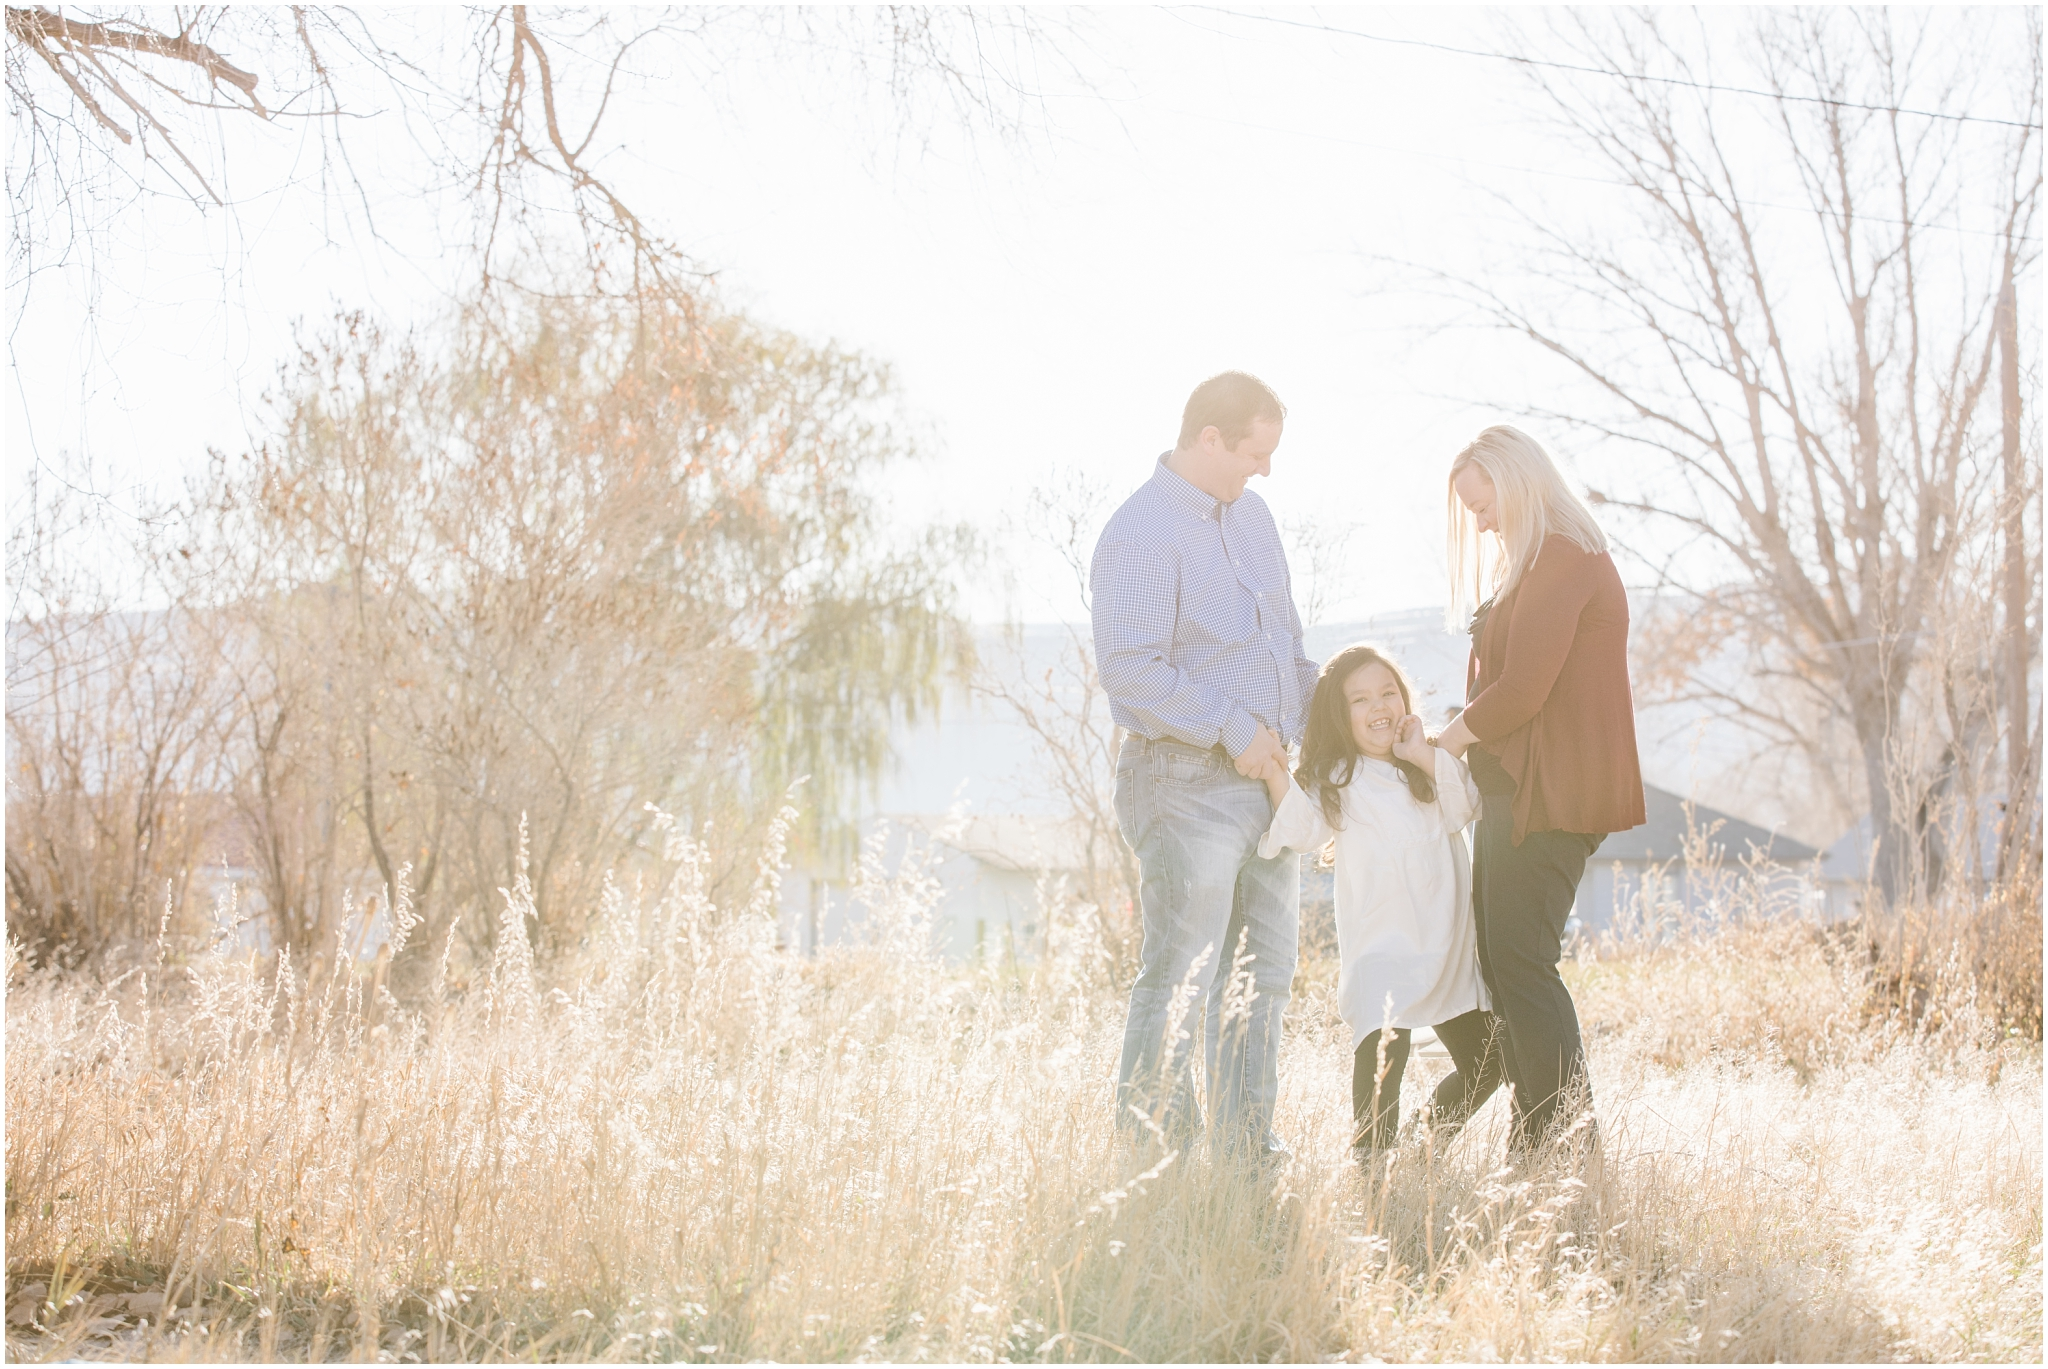 Laws-3_Lizzie-B-Imagery-Utah-Family-Photographer-Salt-Lake-City-Park-City-Davis-County-Clearfield.jpg